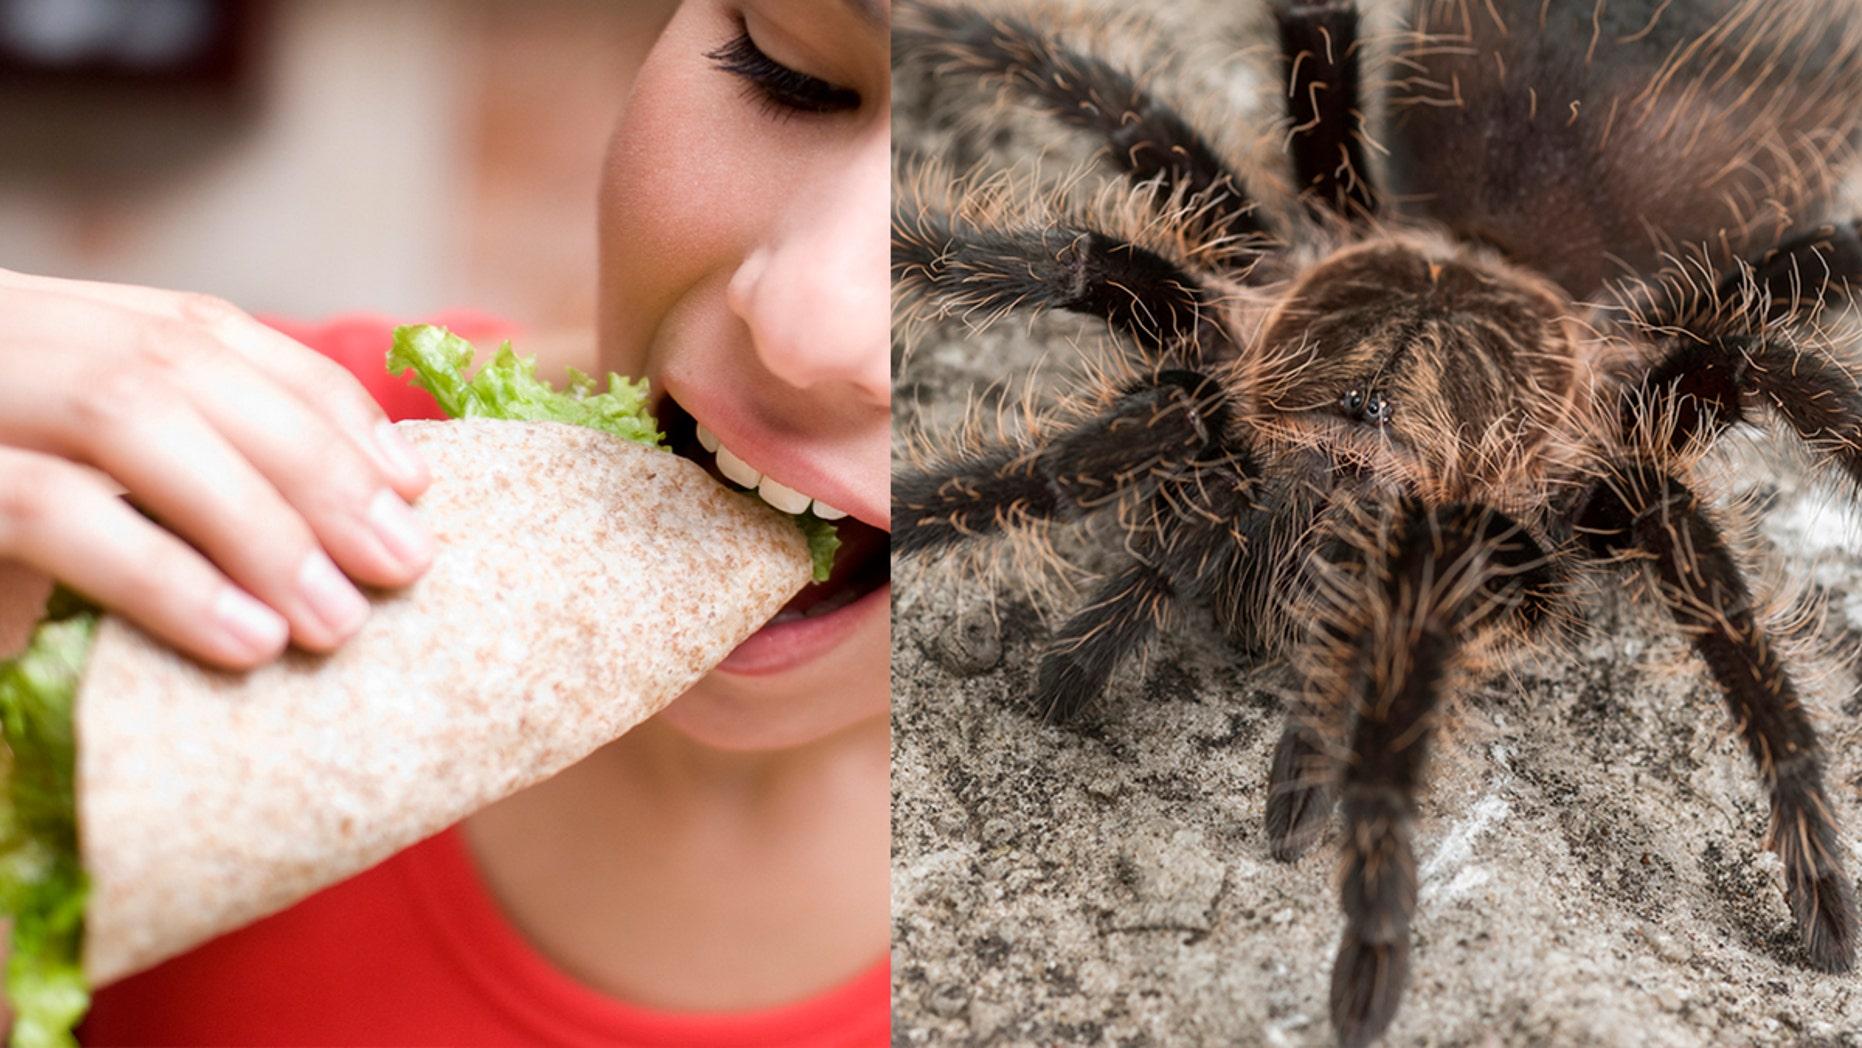 A Mexico City market restaurant recently put the arachnids on its menu.